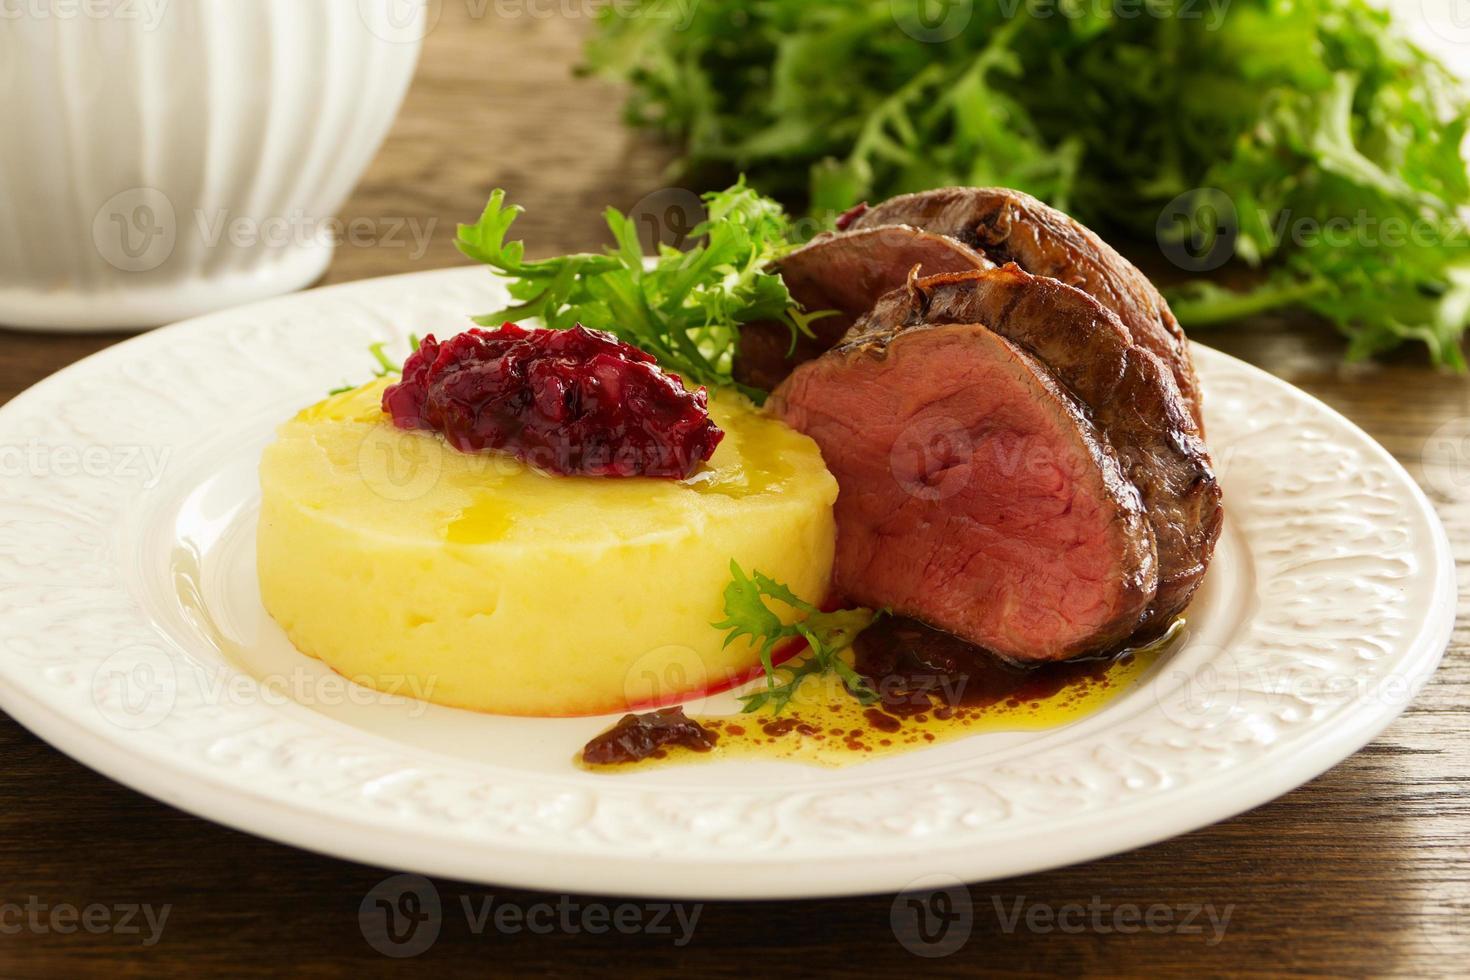 Kalbsbraten mit Kartoffelpüree und Pflaumenchutney. foto